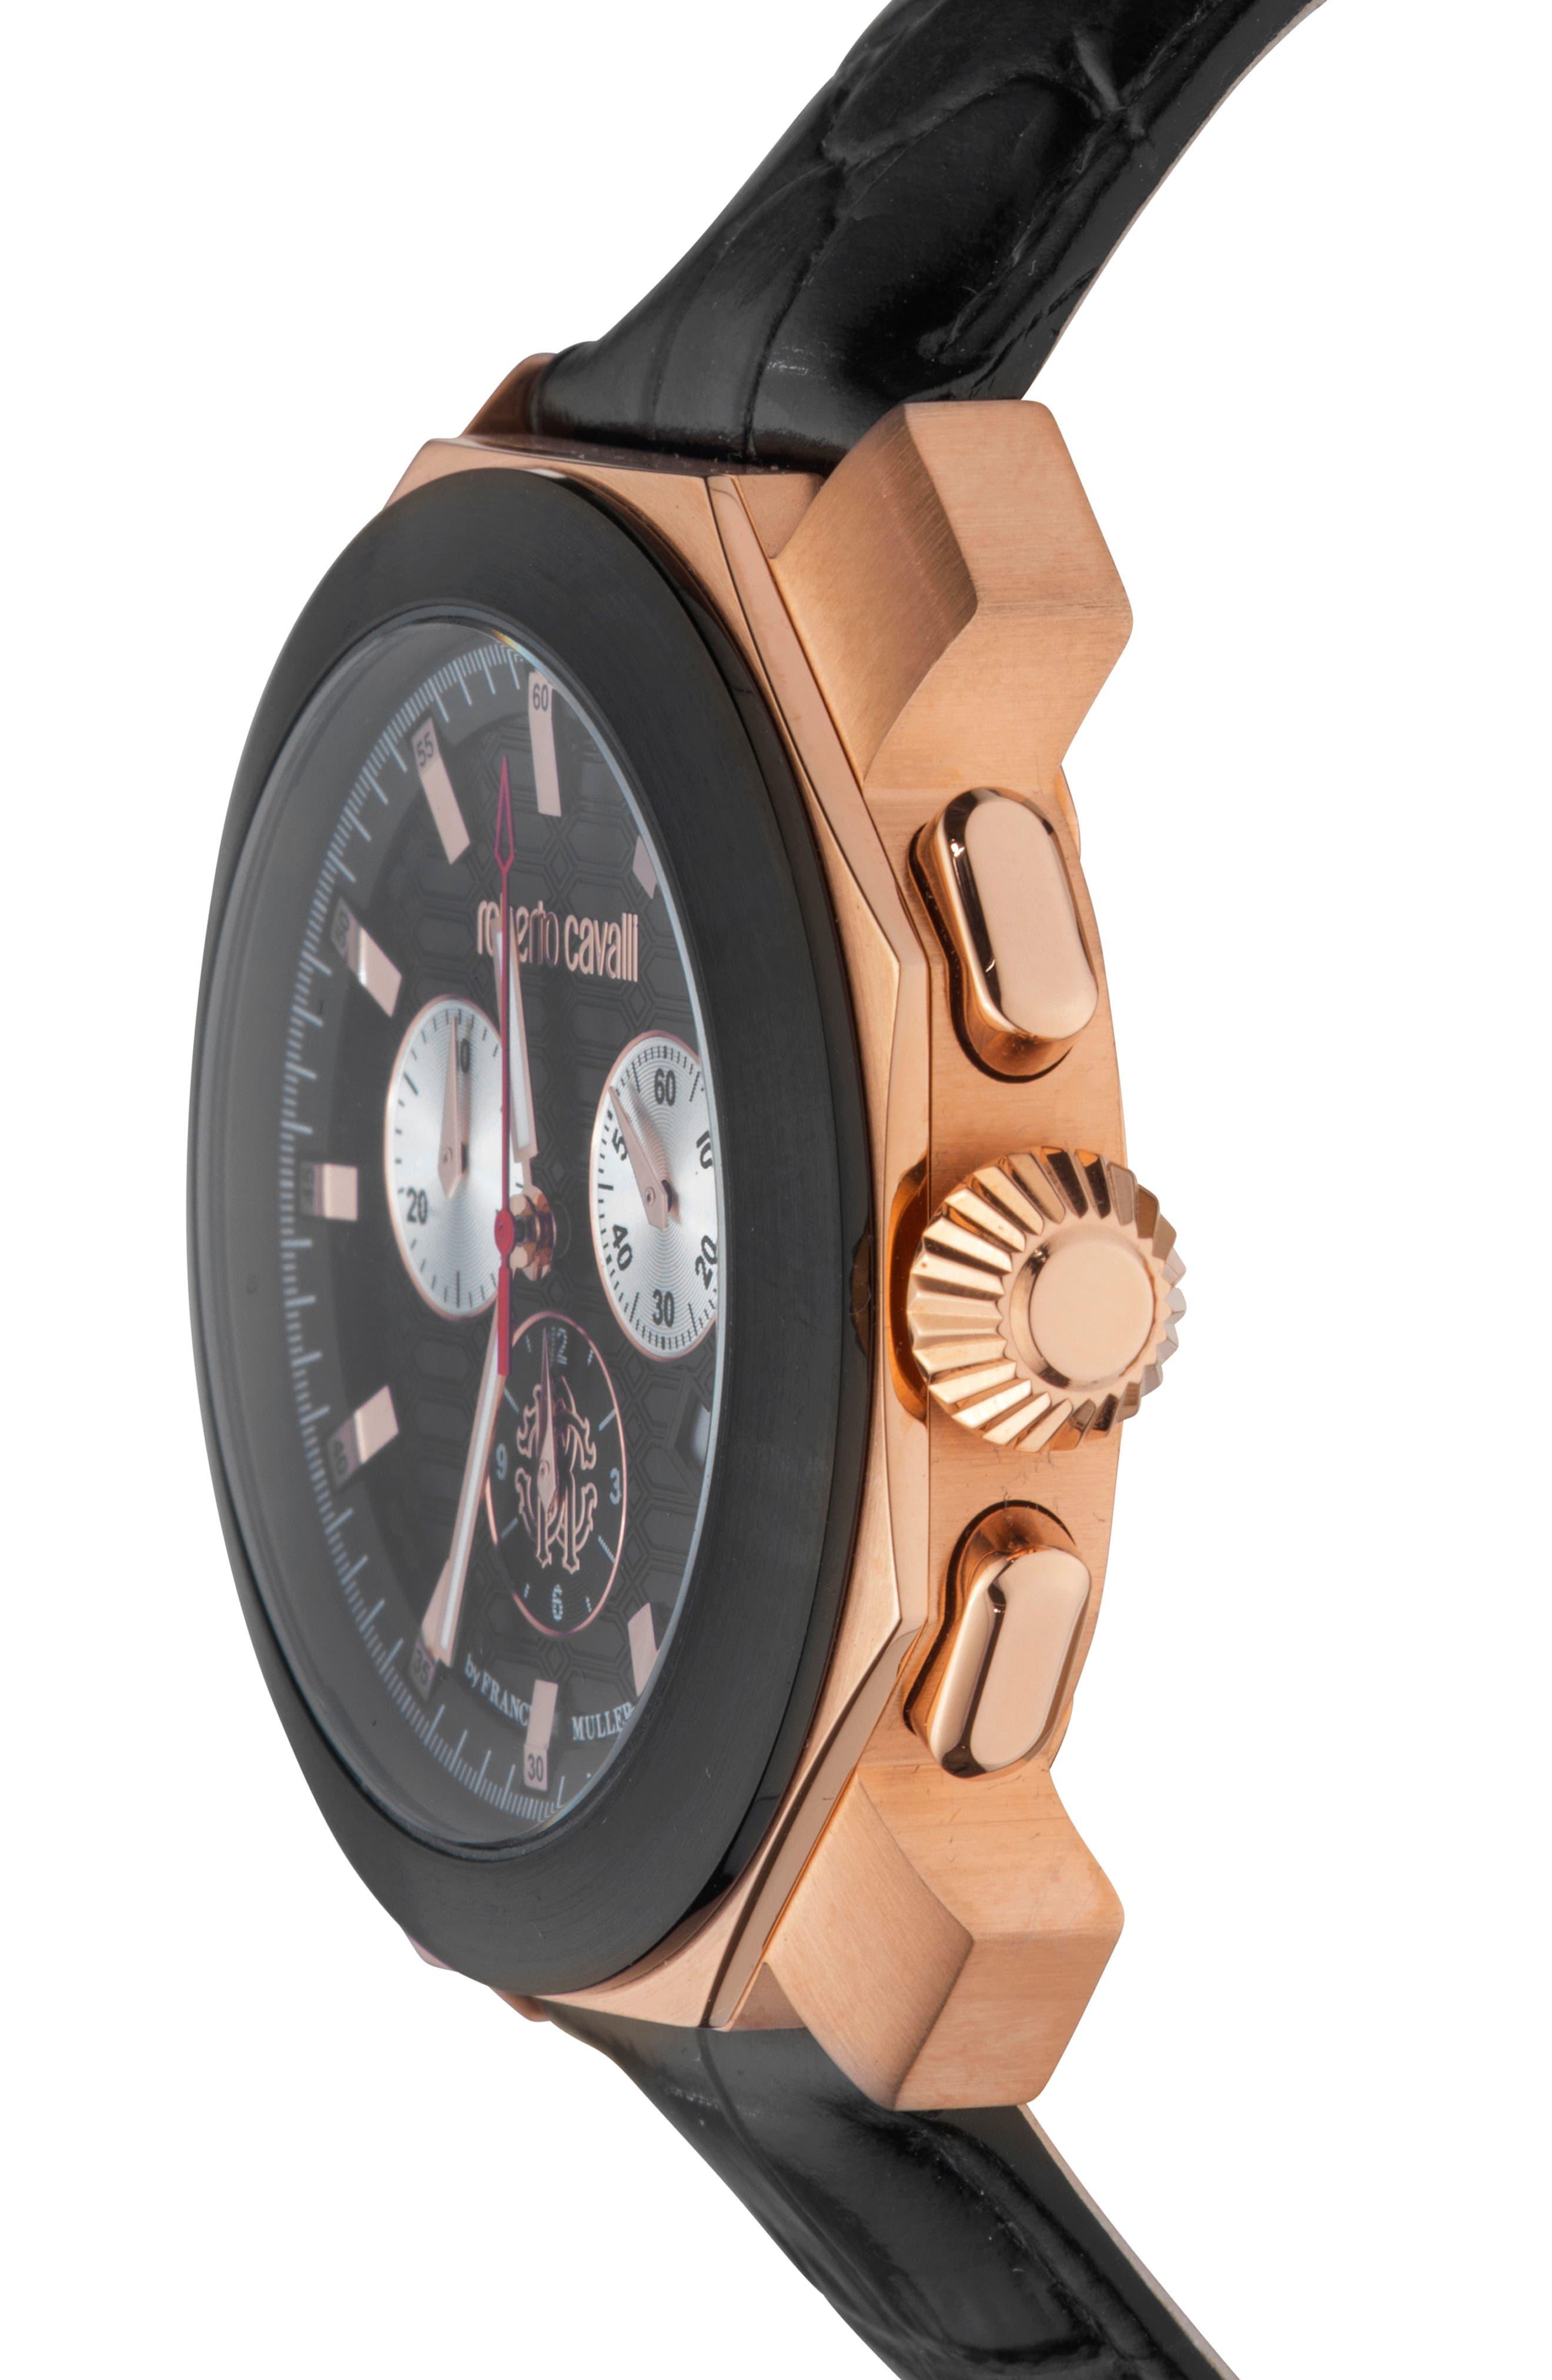 Sport Chronograph Leather Strap Watch,                             Alternate thumbnail 3, color,                             BLACK/ ROSE GOLD/ BLACK